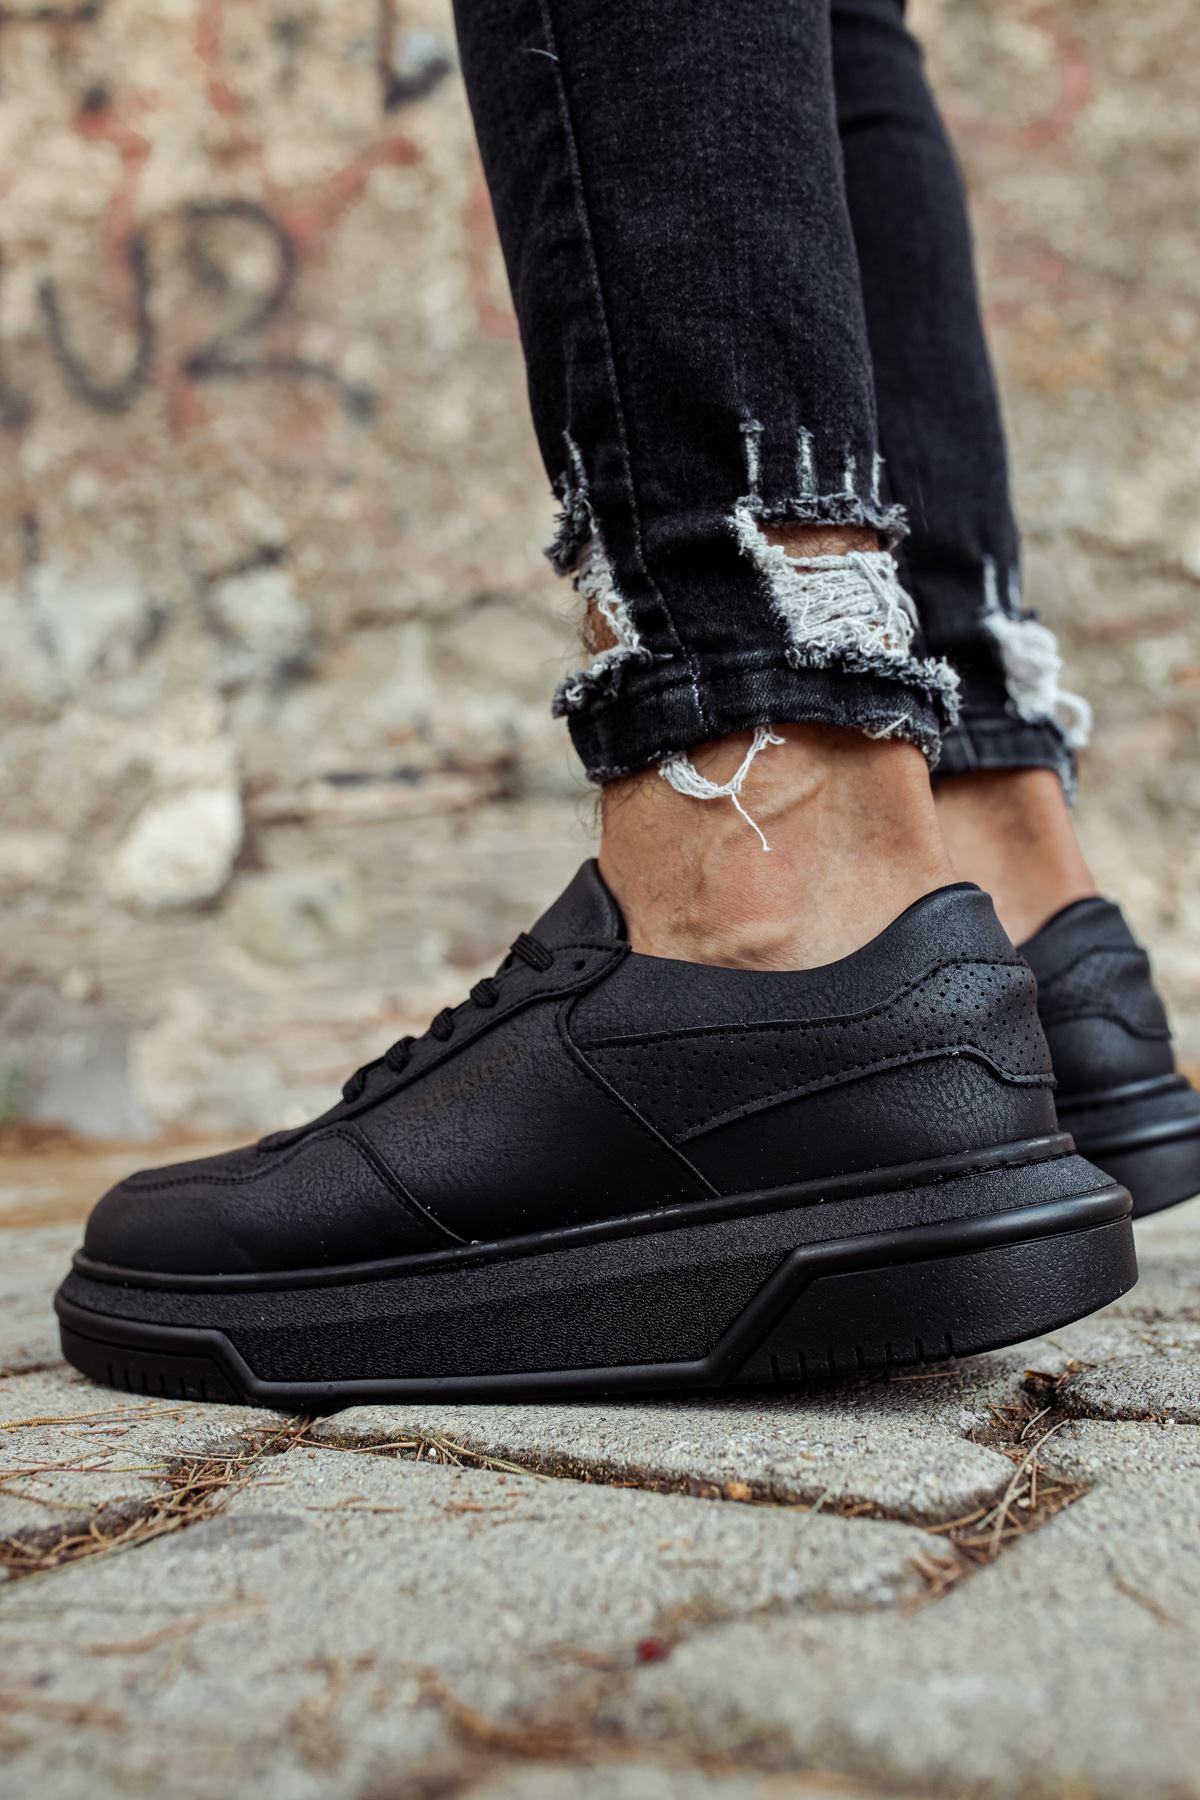 Chekich CH075 İpekyol Siyah Taban Erkek Ayakkabı SIYAH